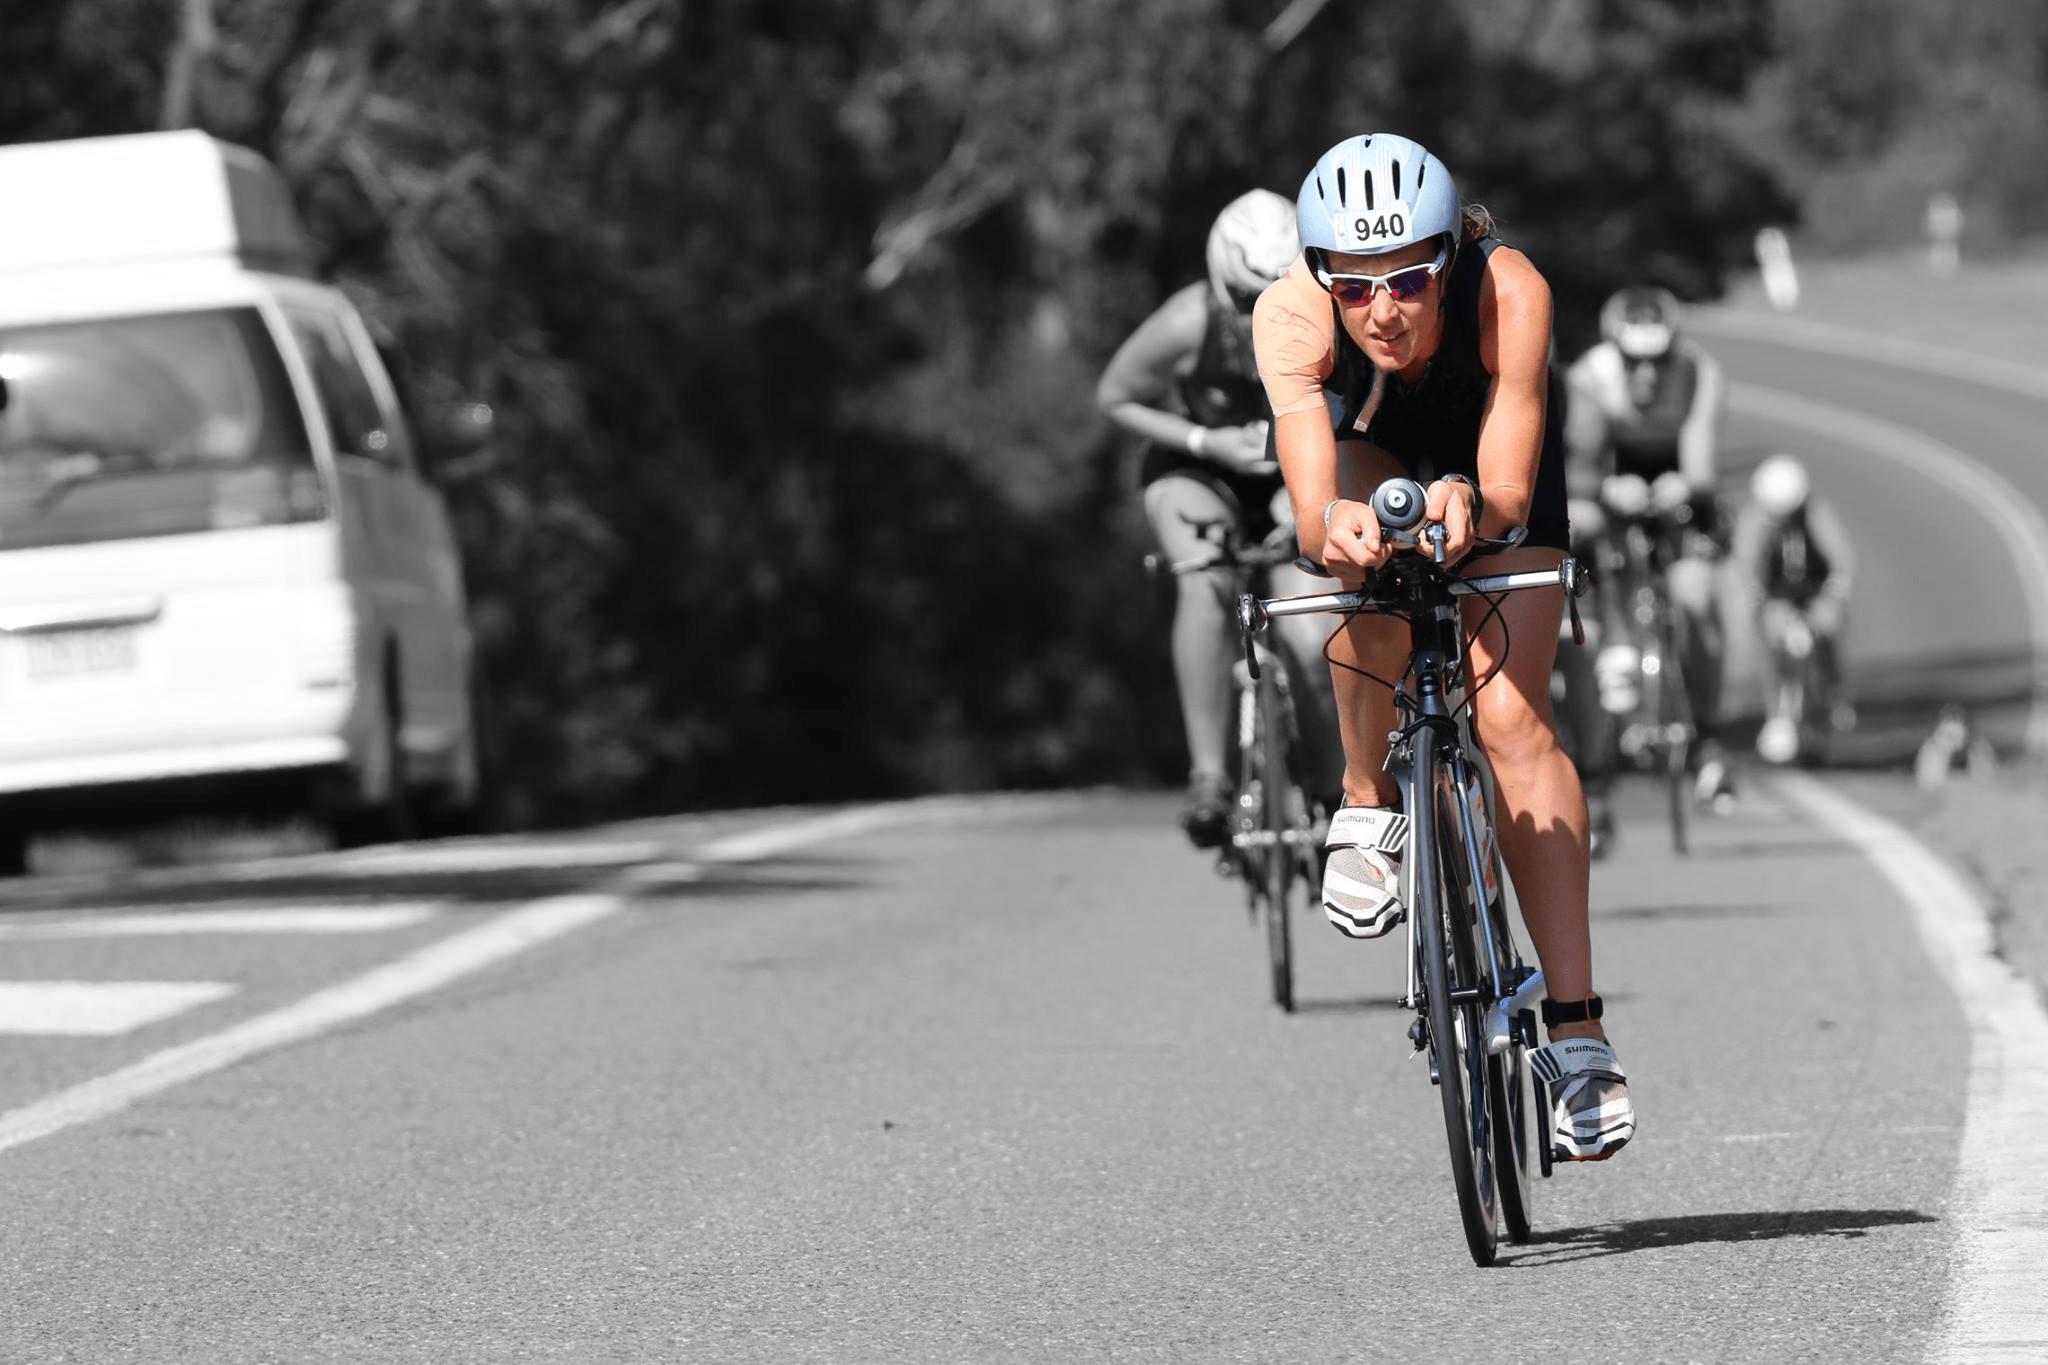 Triathlon Coaching and Racing